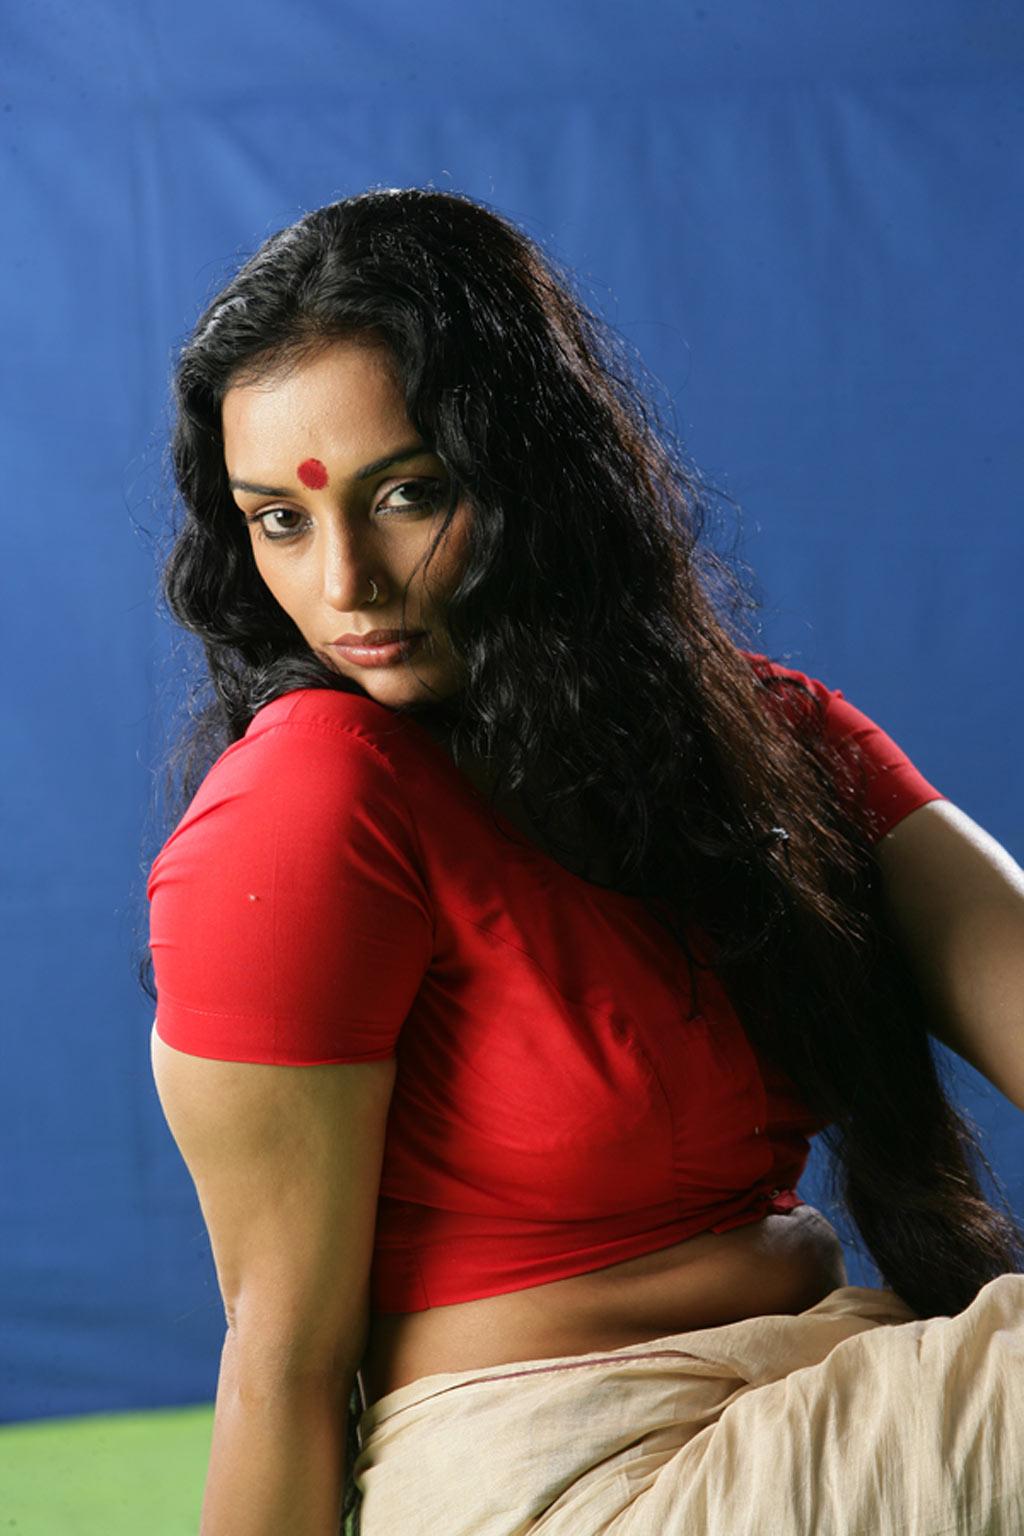 Sexy Images Of Shweta Menon 116